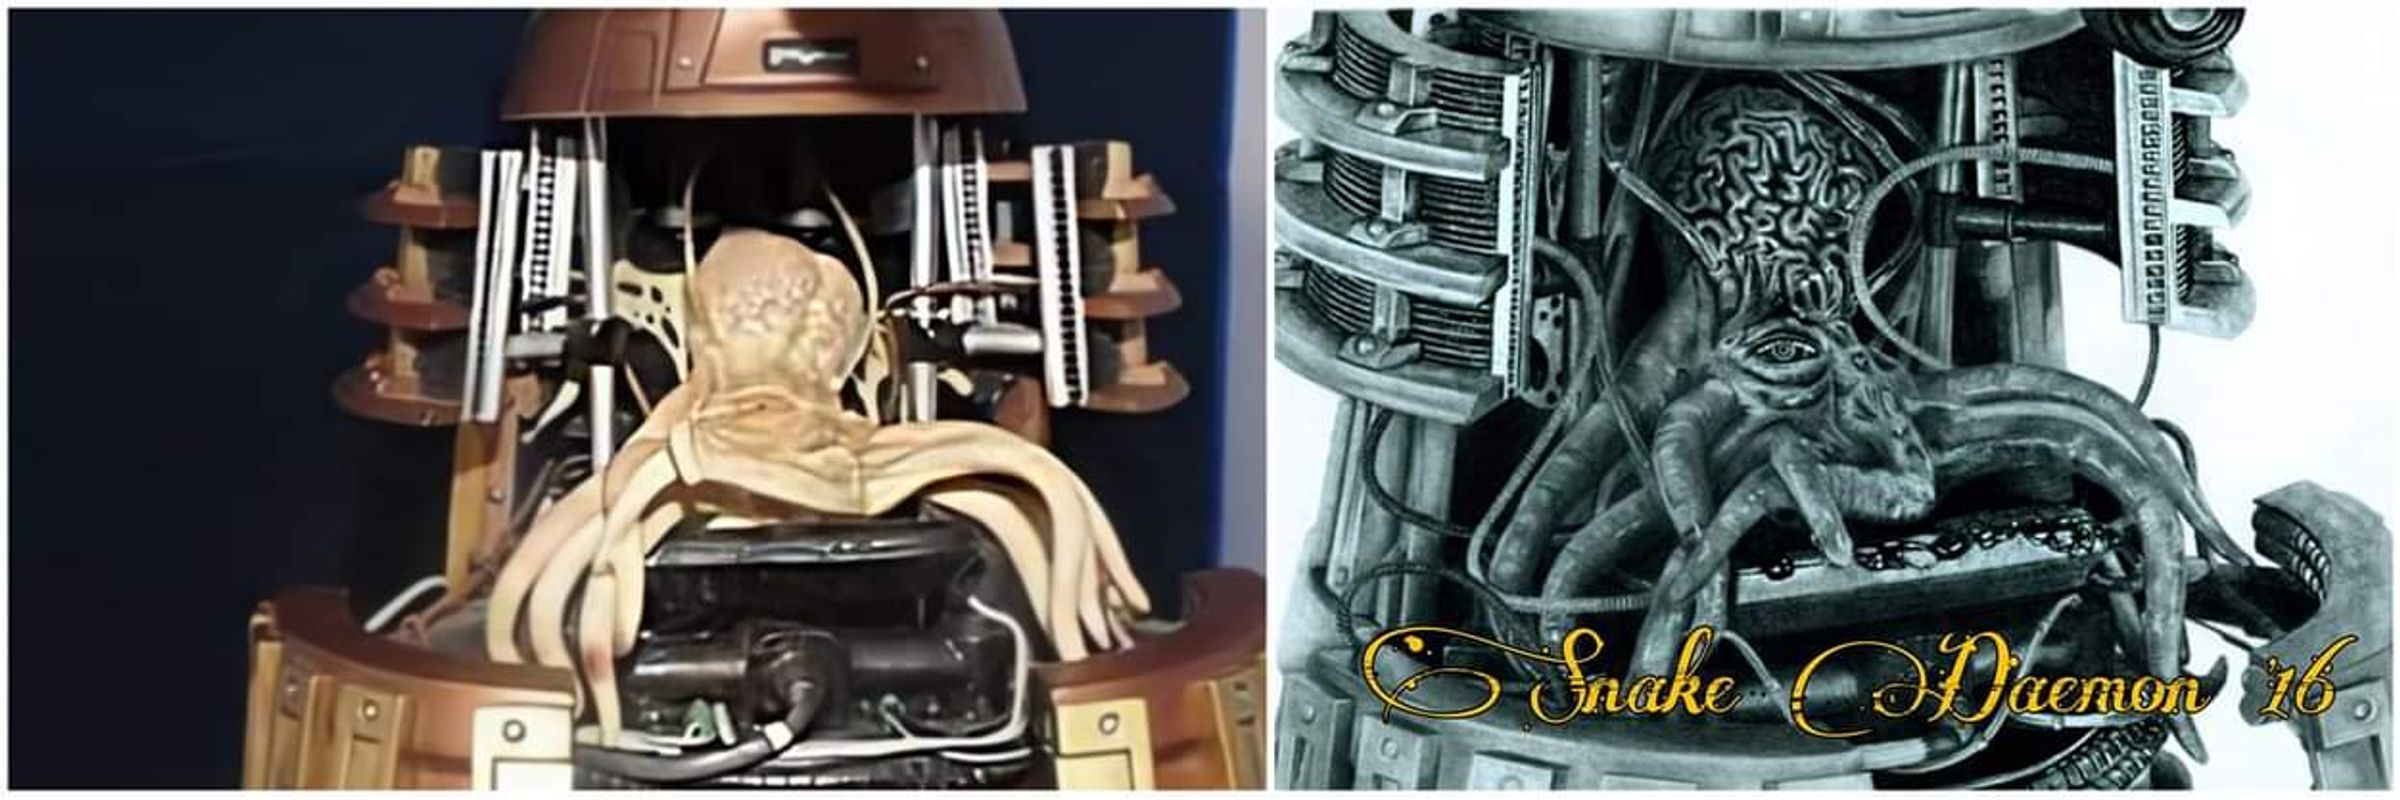 Dalek - figure/drawing comparison